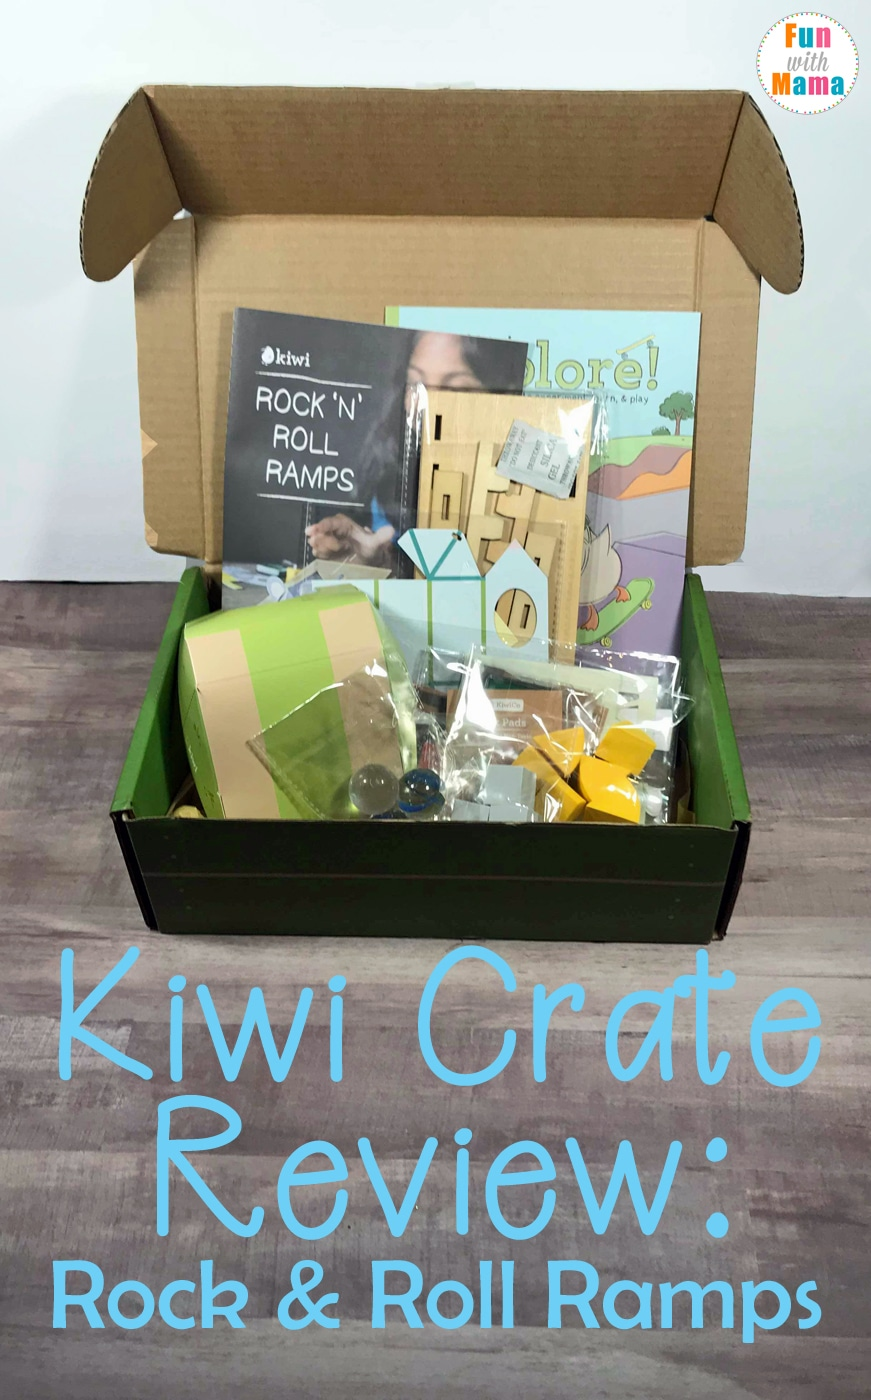 kiwi box for kids